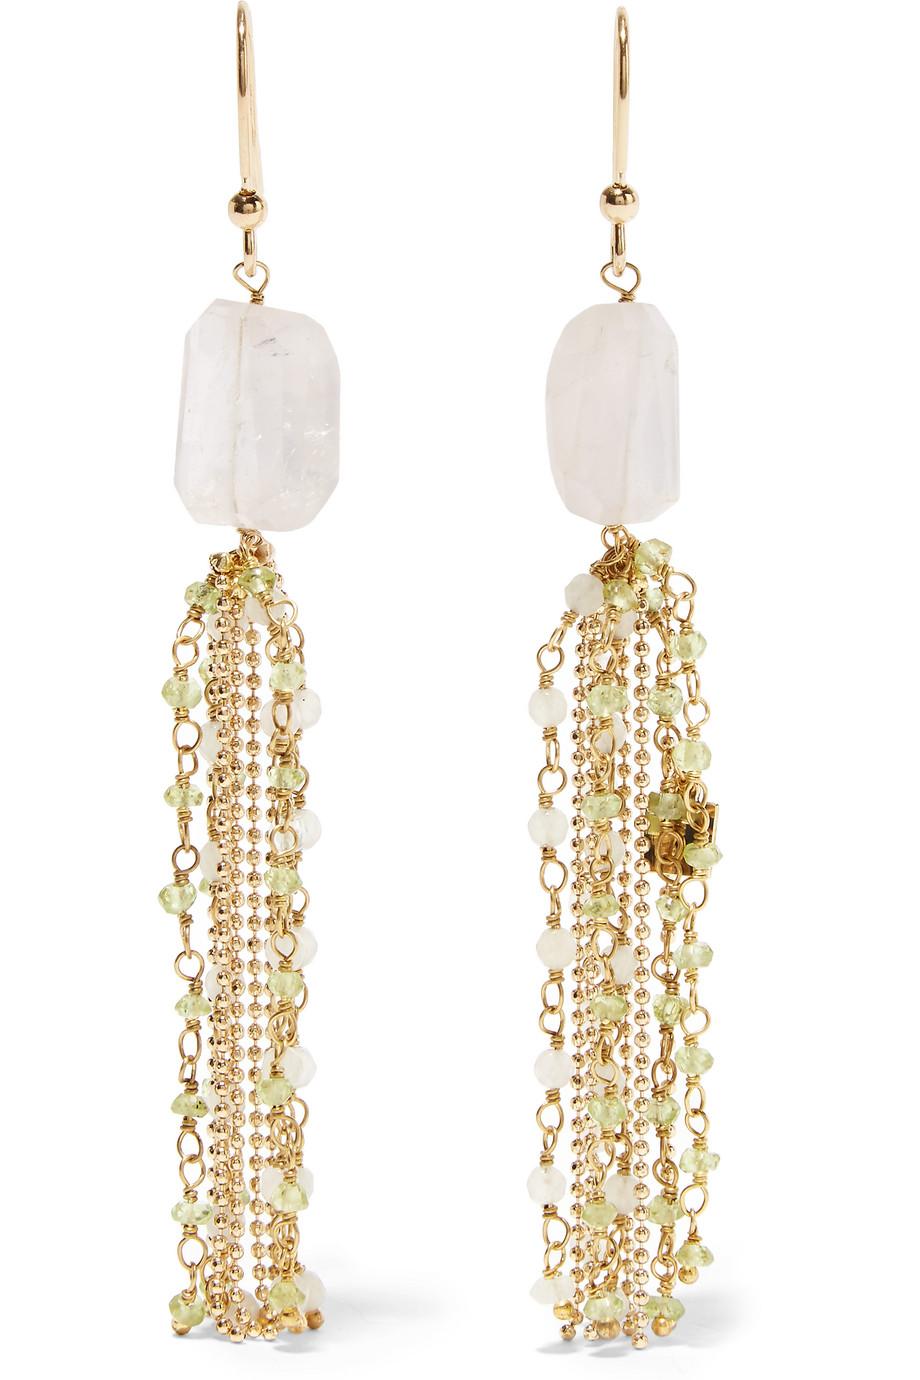 Rosantica Etrusca Gold-Tone Quartz Earrings, Women's